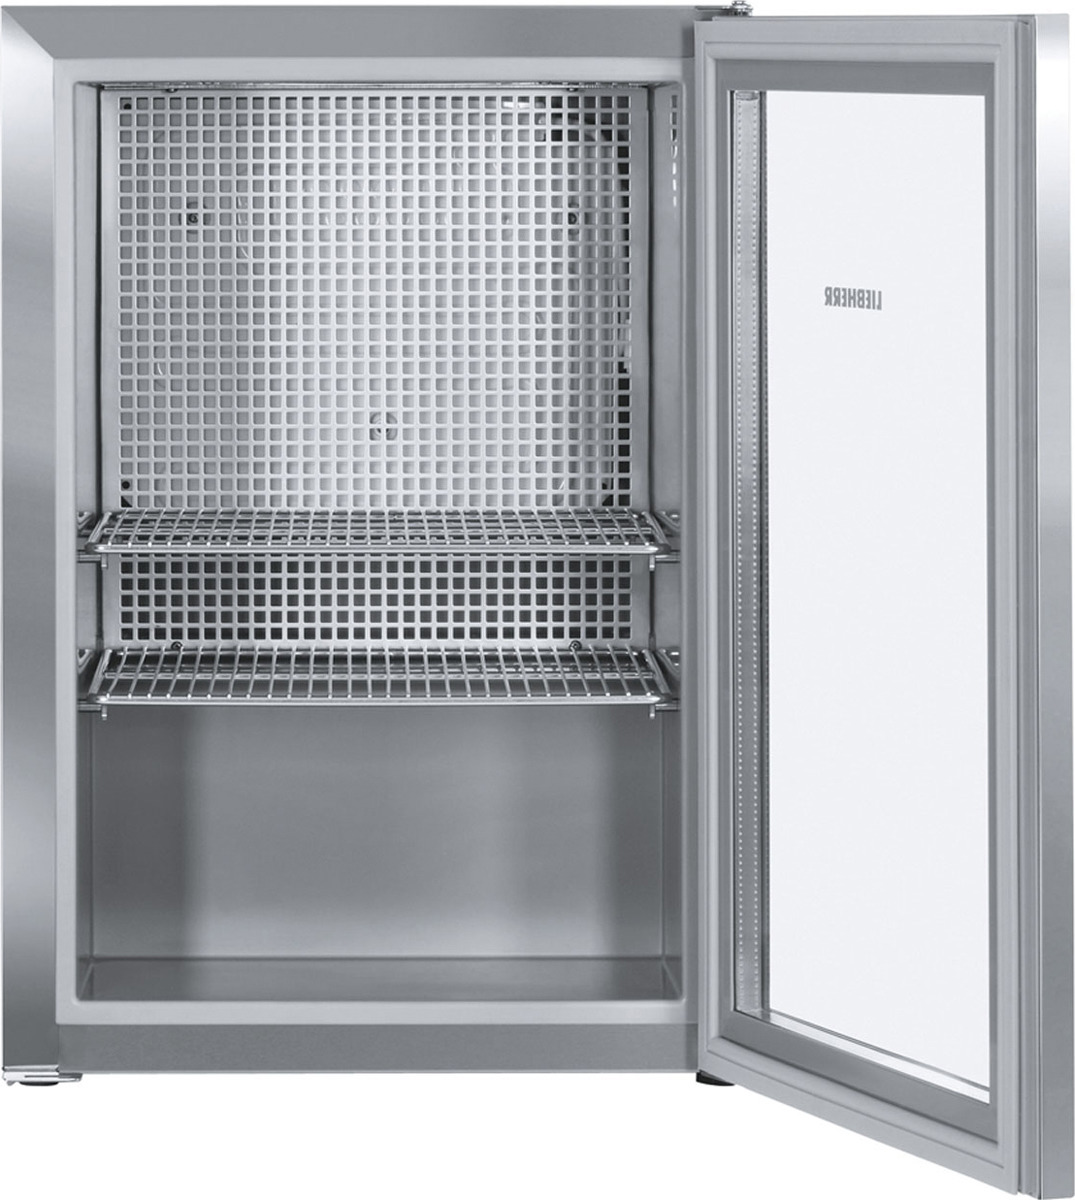 Холодильник Liebherr CMes 502-20001, серебристый цена 2017